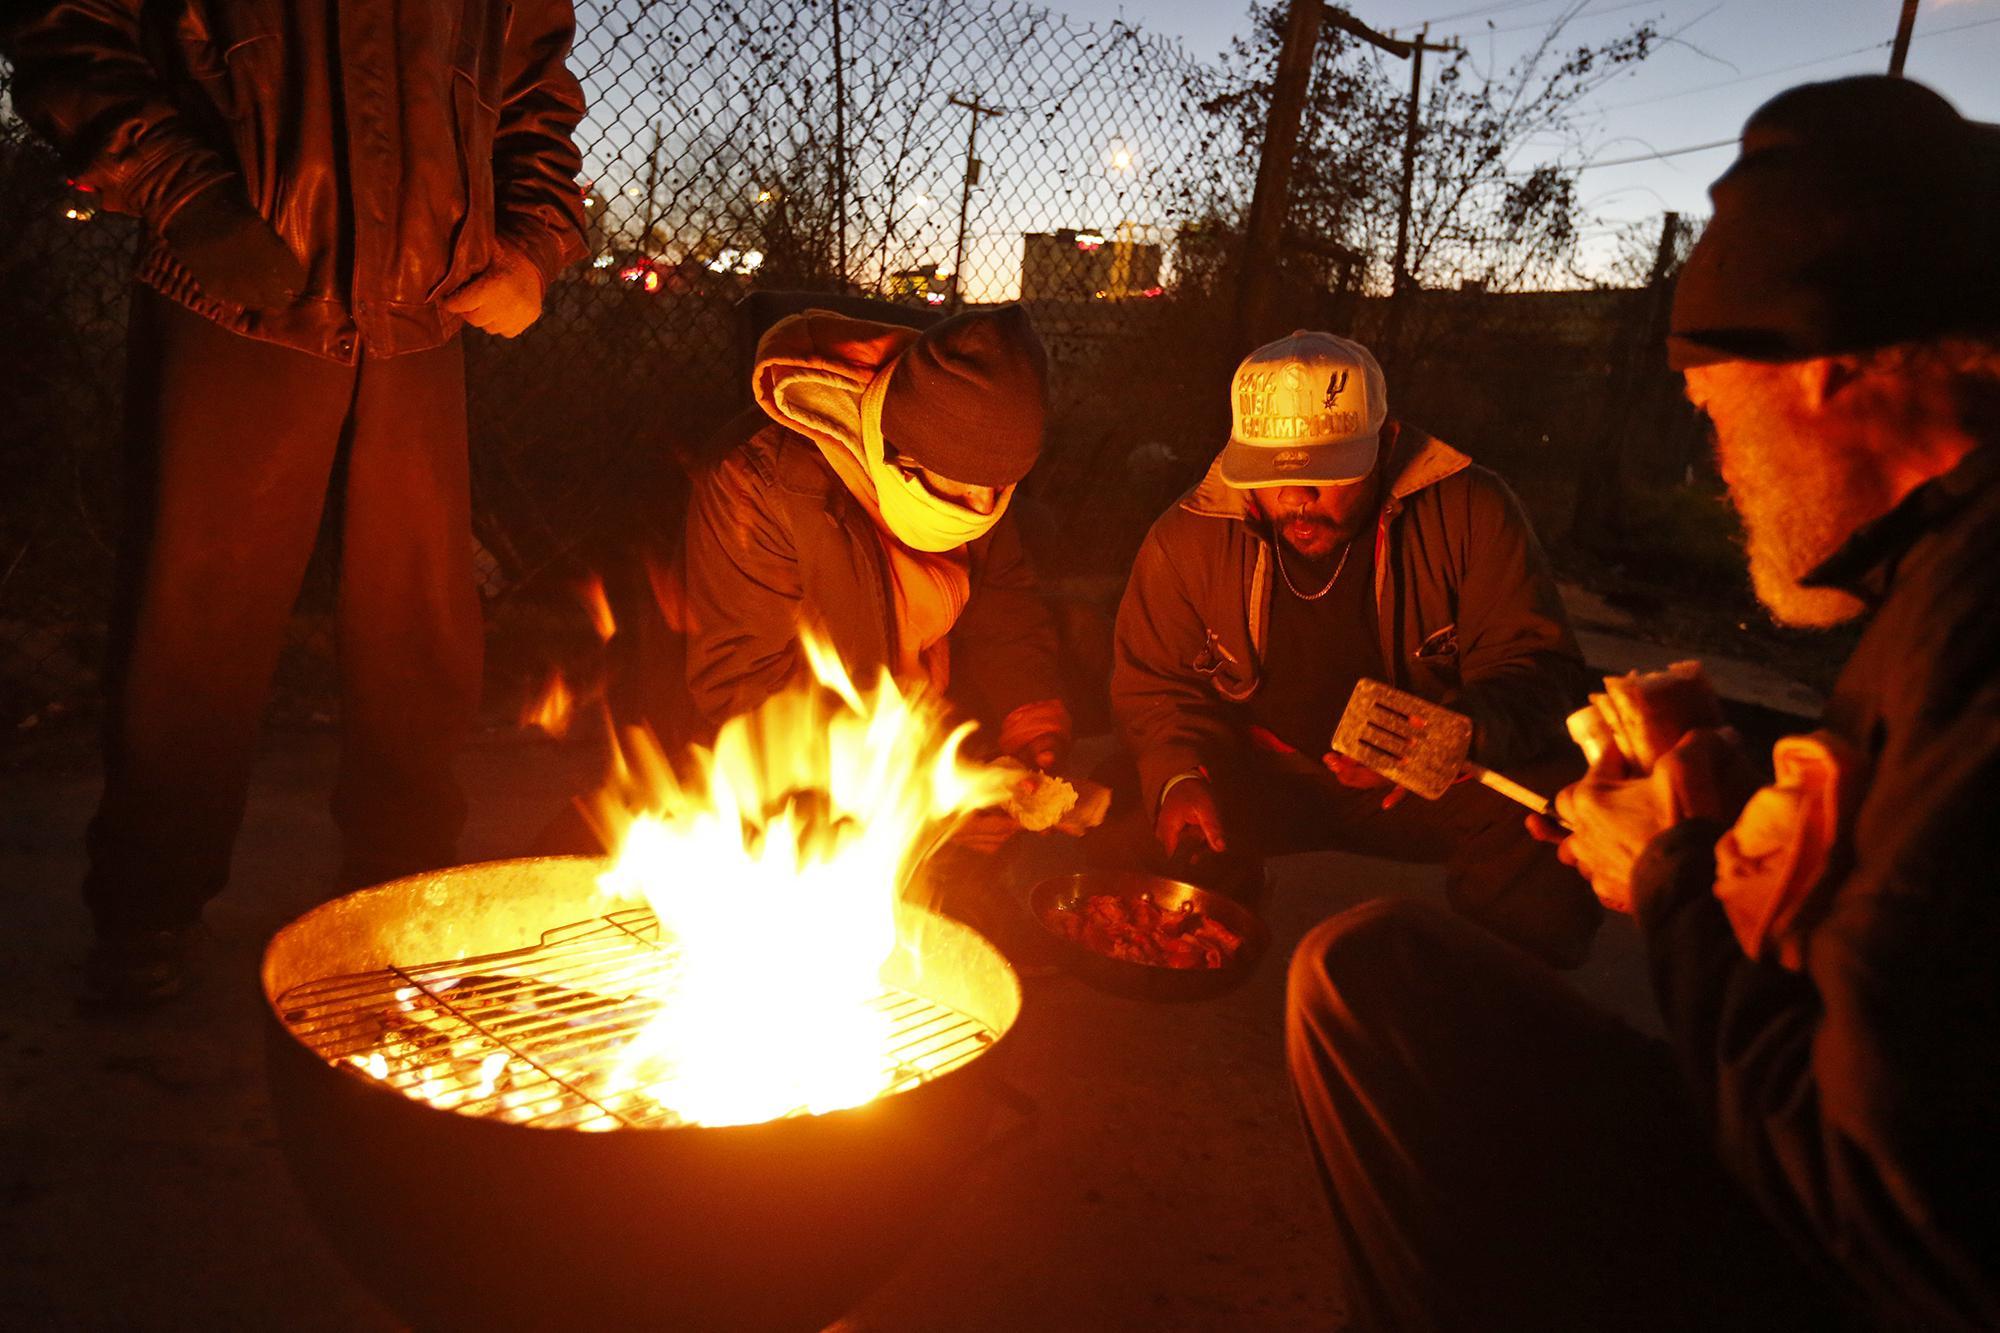 Feds award San Antonio $10M for programs that combat homelessness